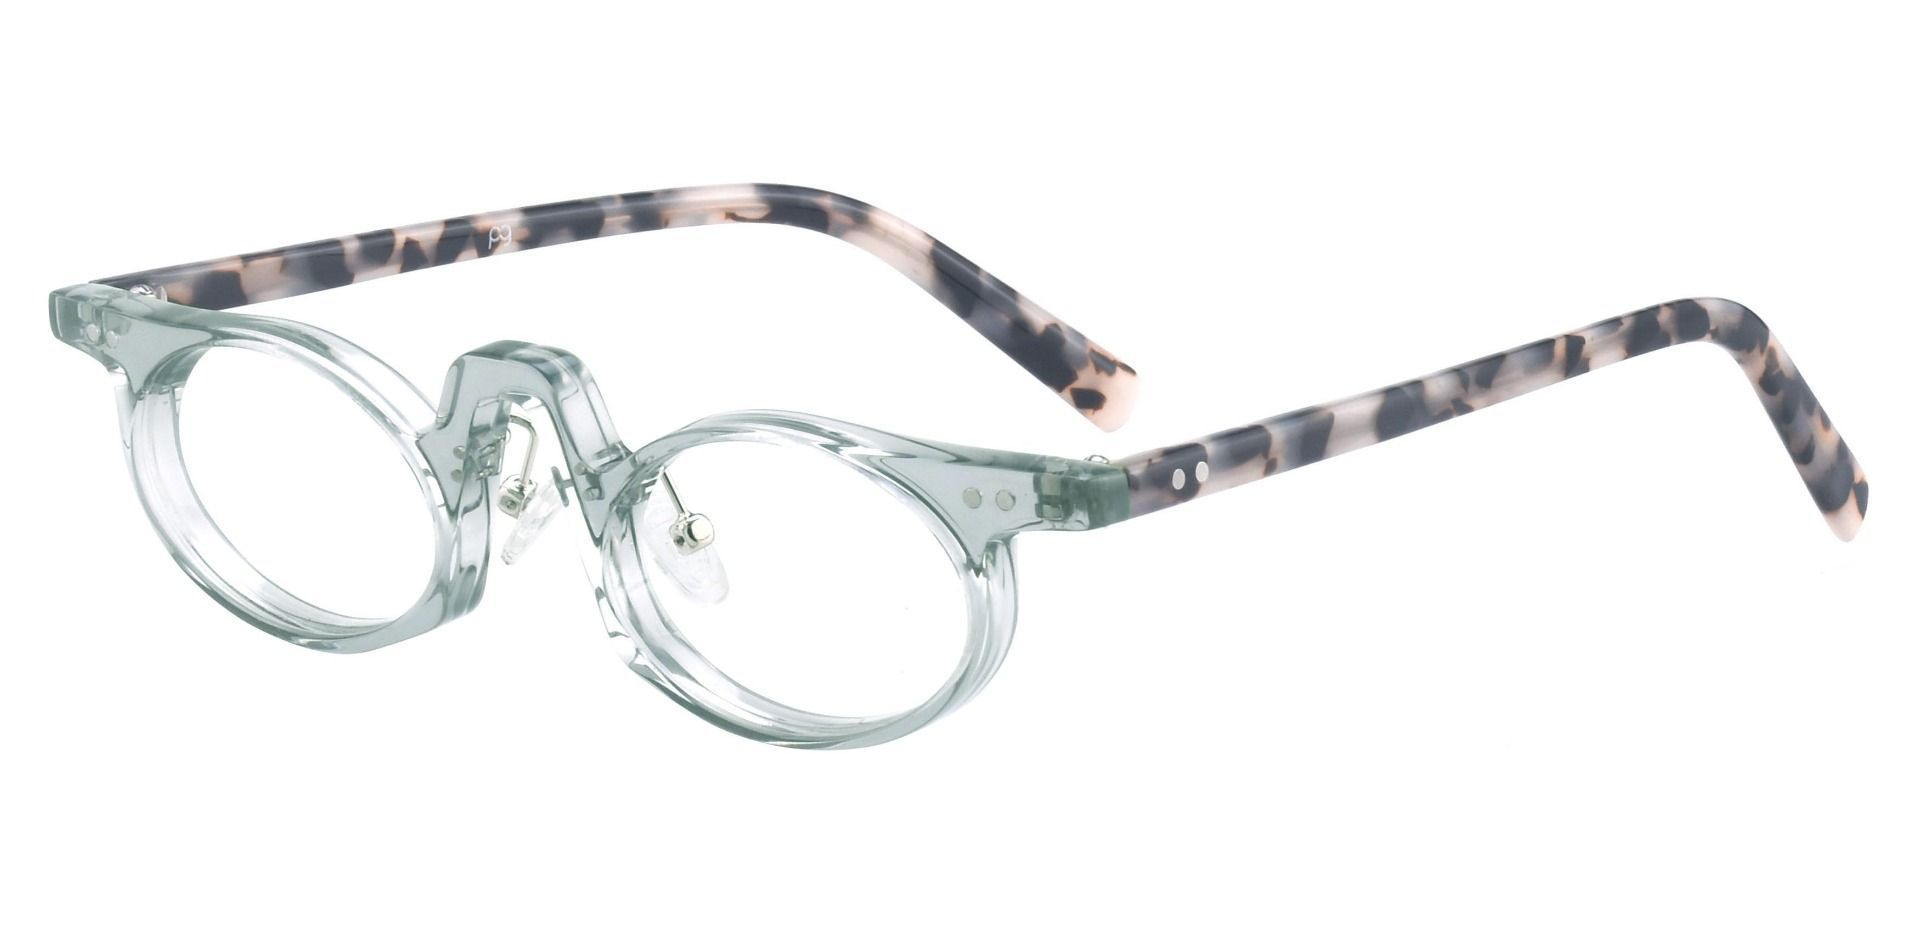 Hamlin Oval Single Vision Glasses - Gray